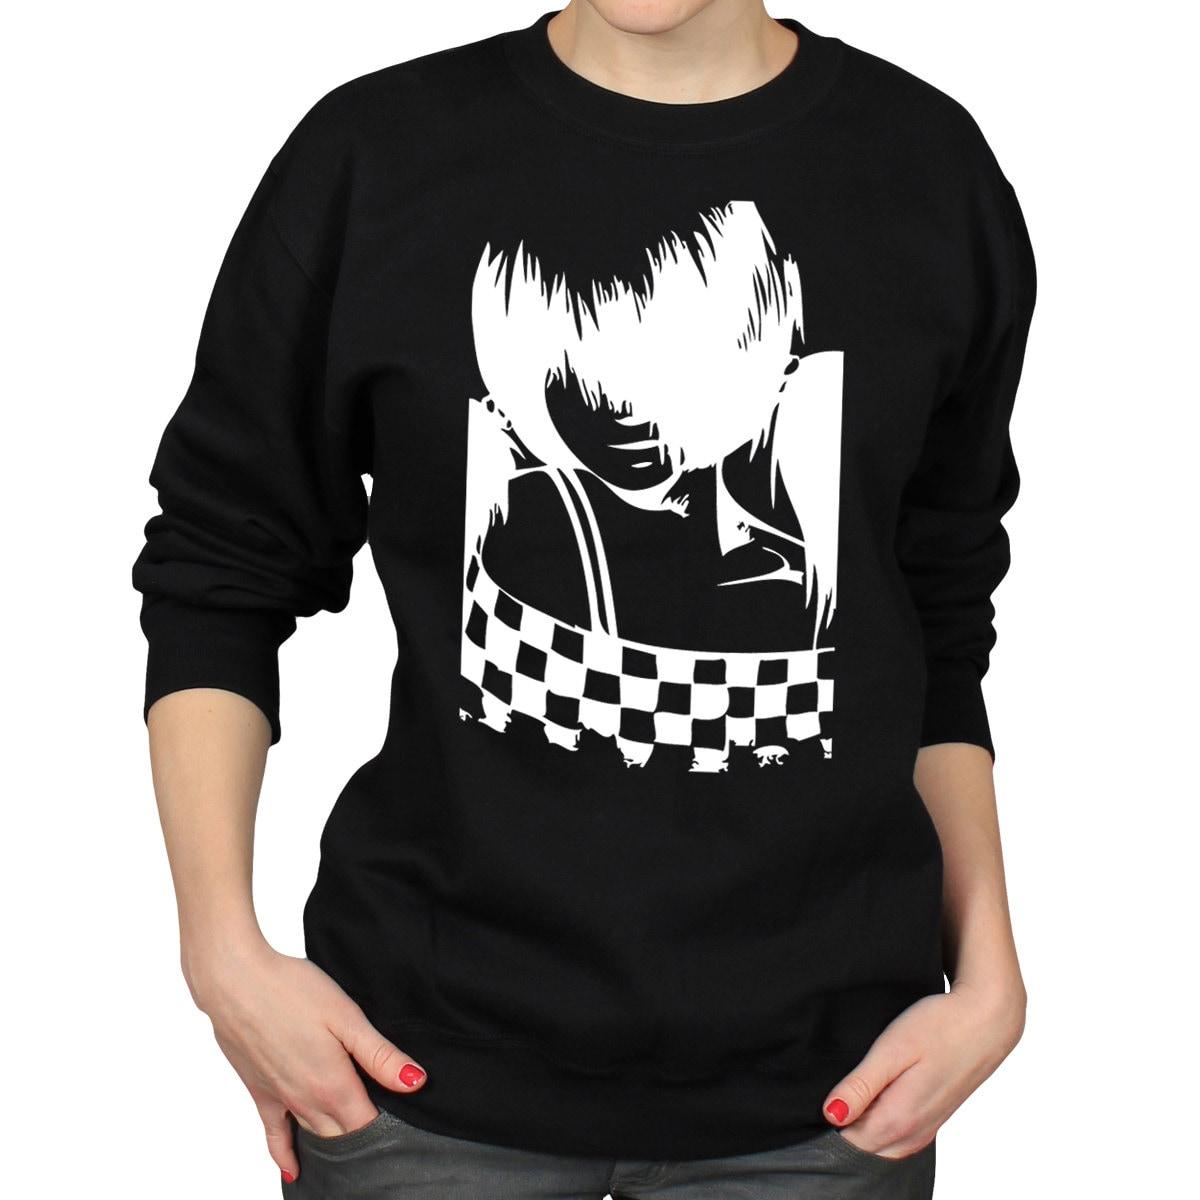 Emo Anime Girl Sweater Two Tone Ska Music Crewneck Jumper